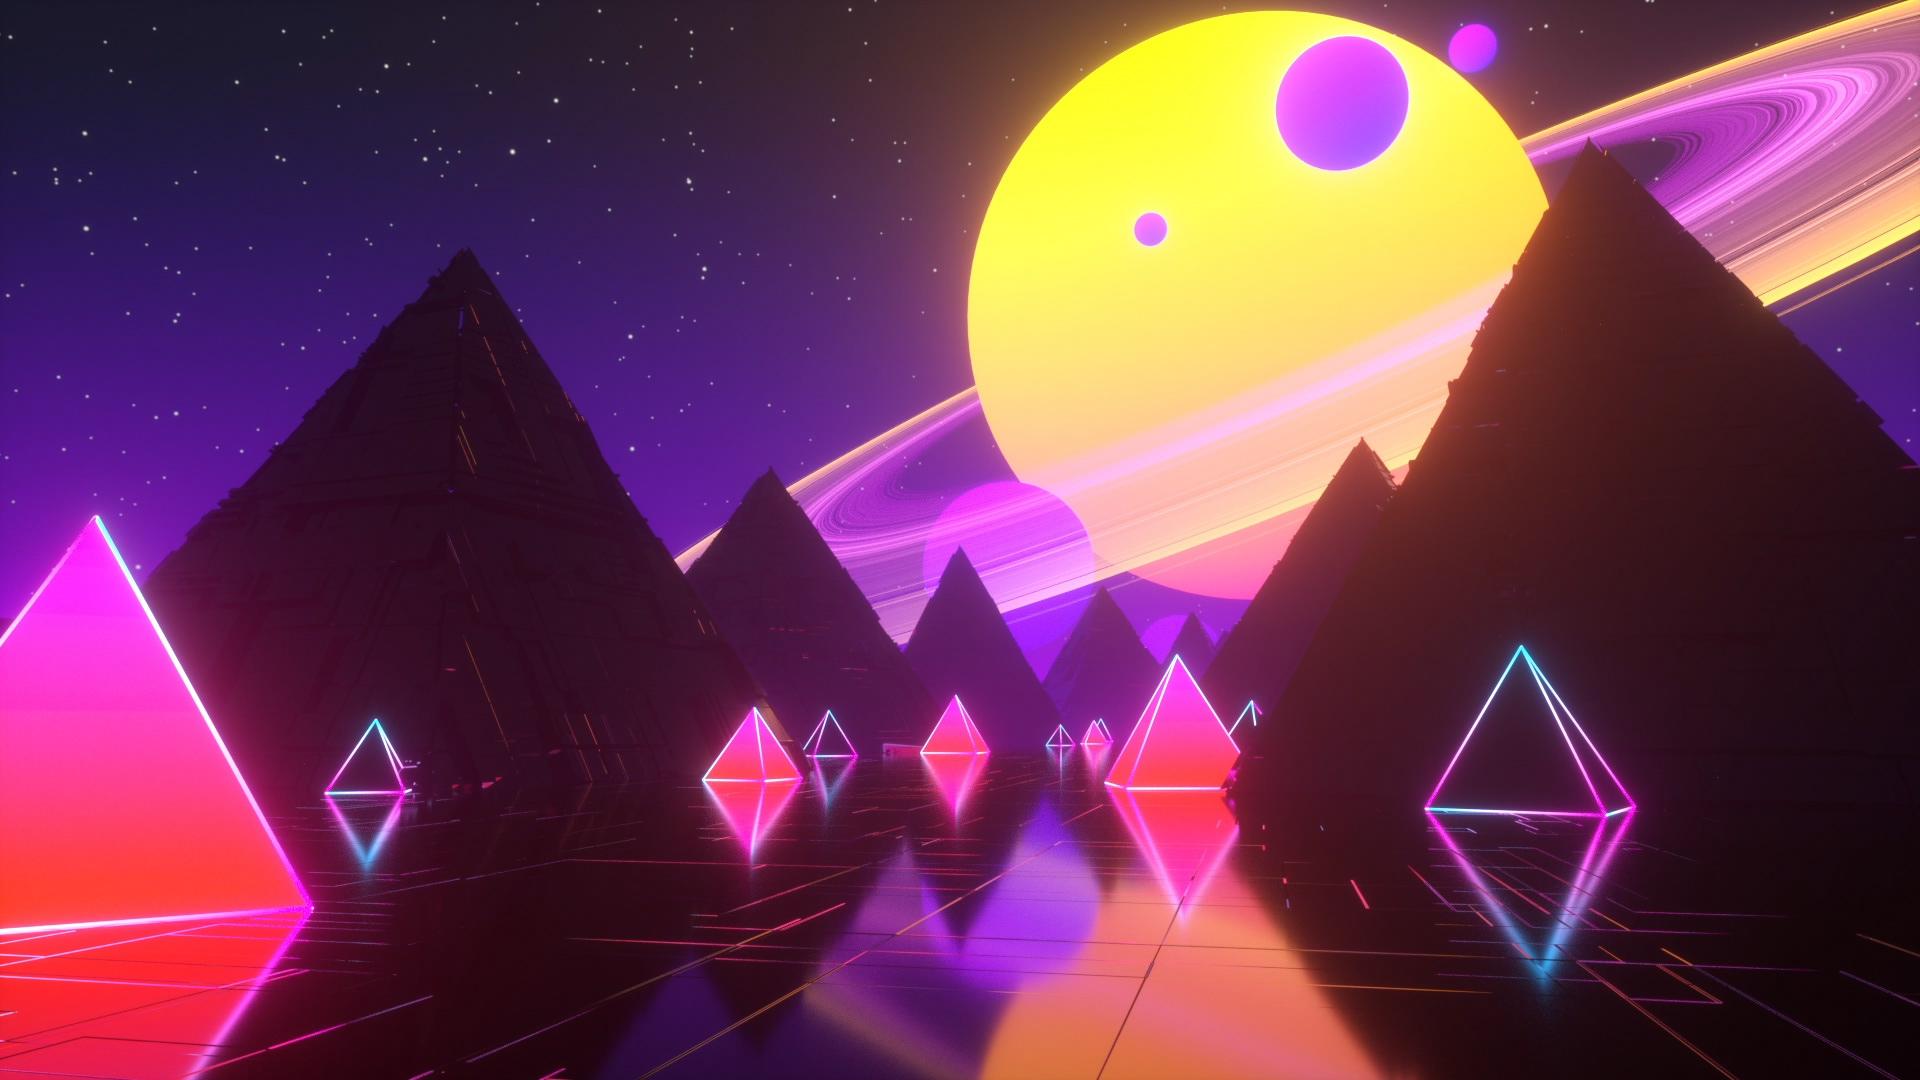 Wallpaper Sun Planet Pyramid 1920x1080 Alex93s